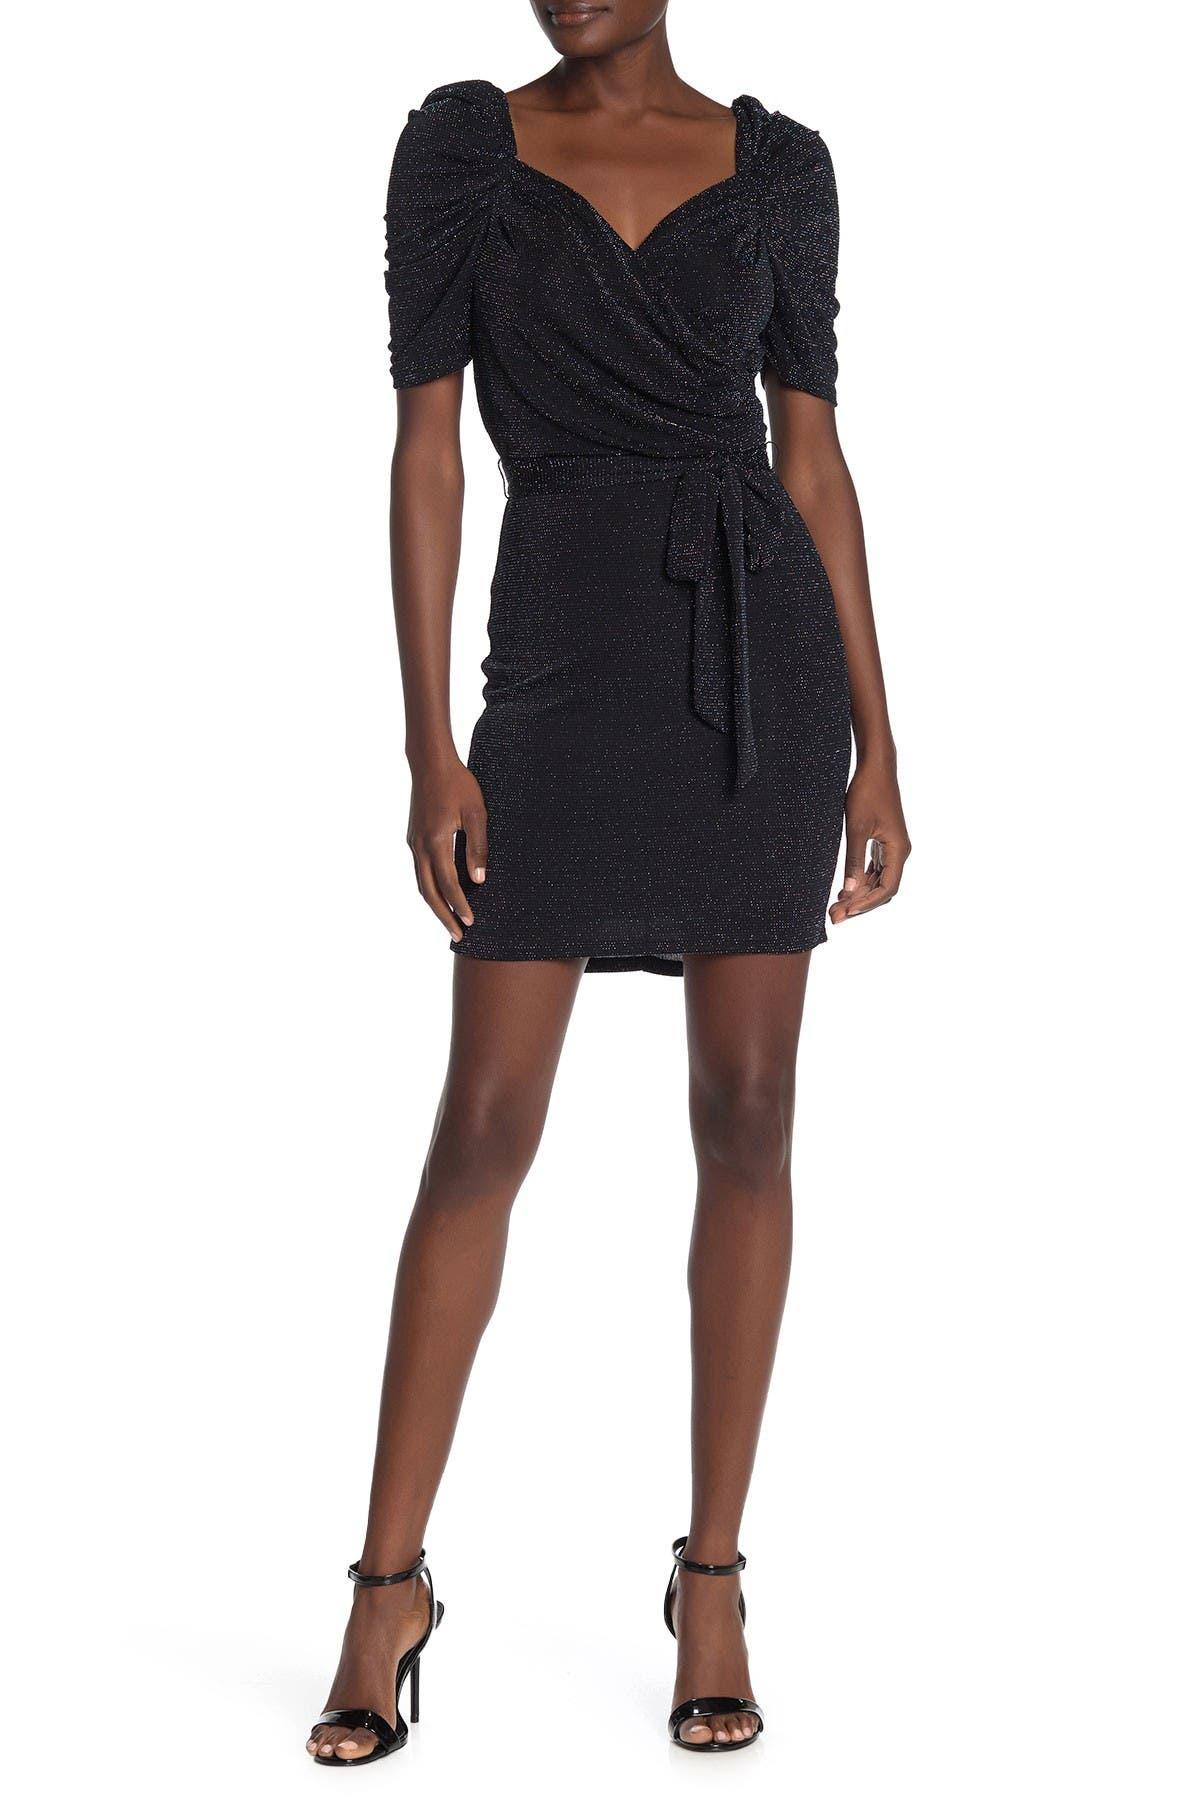 Image of MAX & ASH Puff Sleeve Metallic Knit Wrap Mini Dress